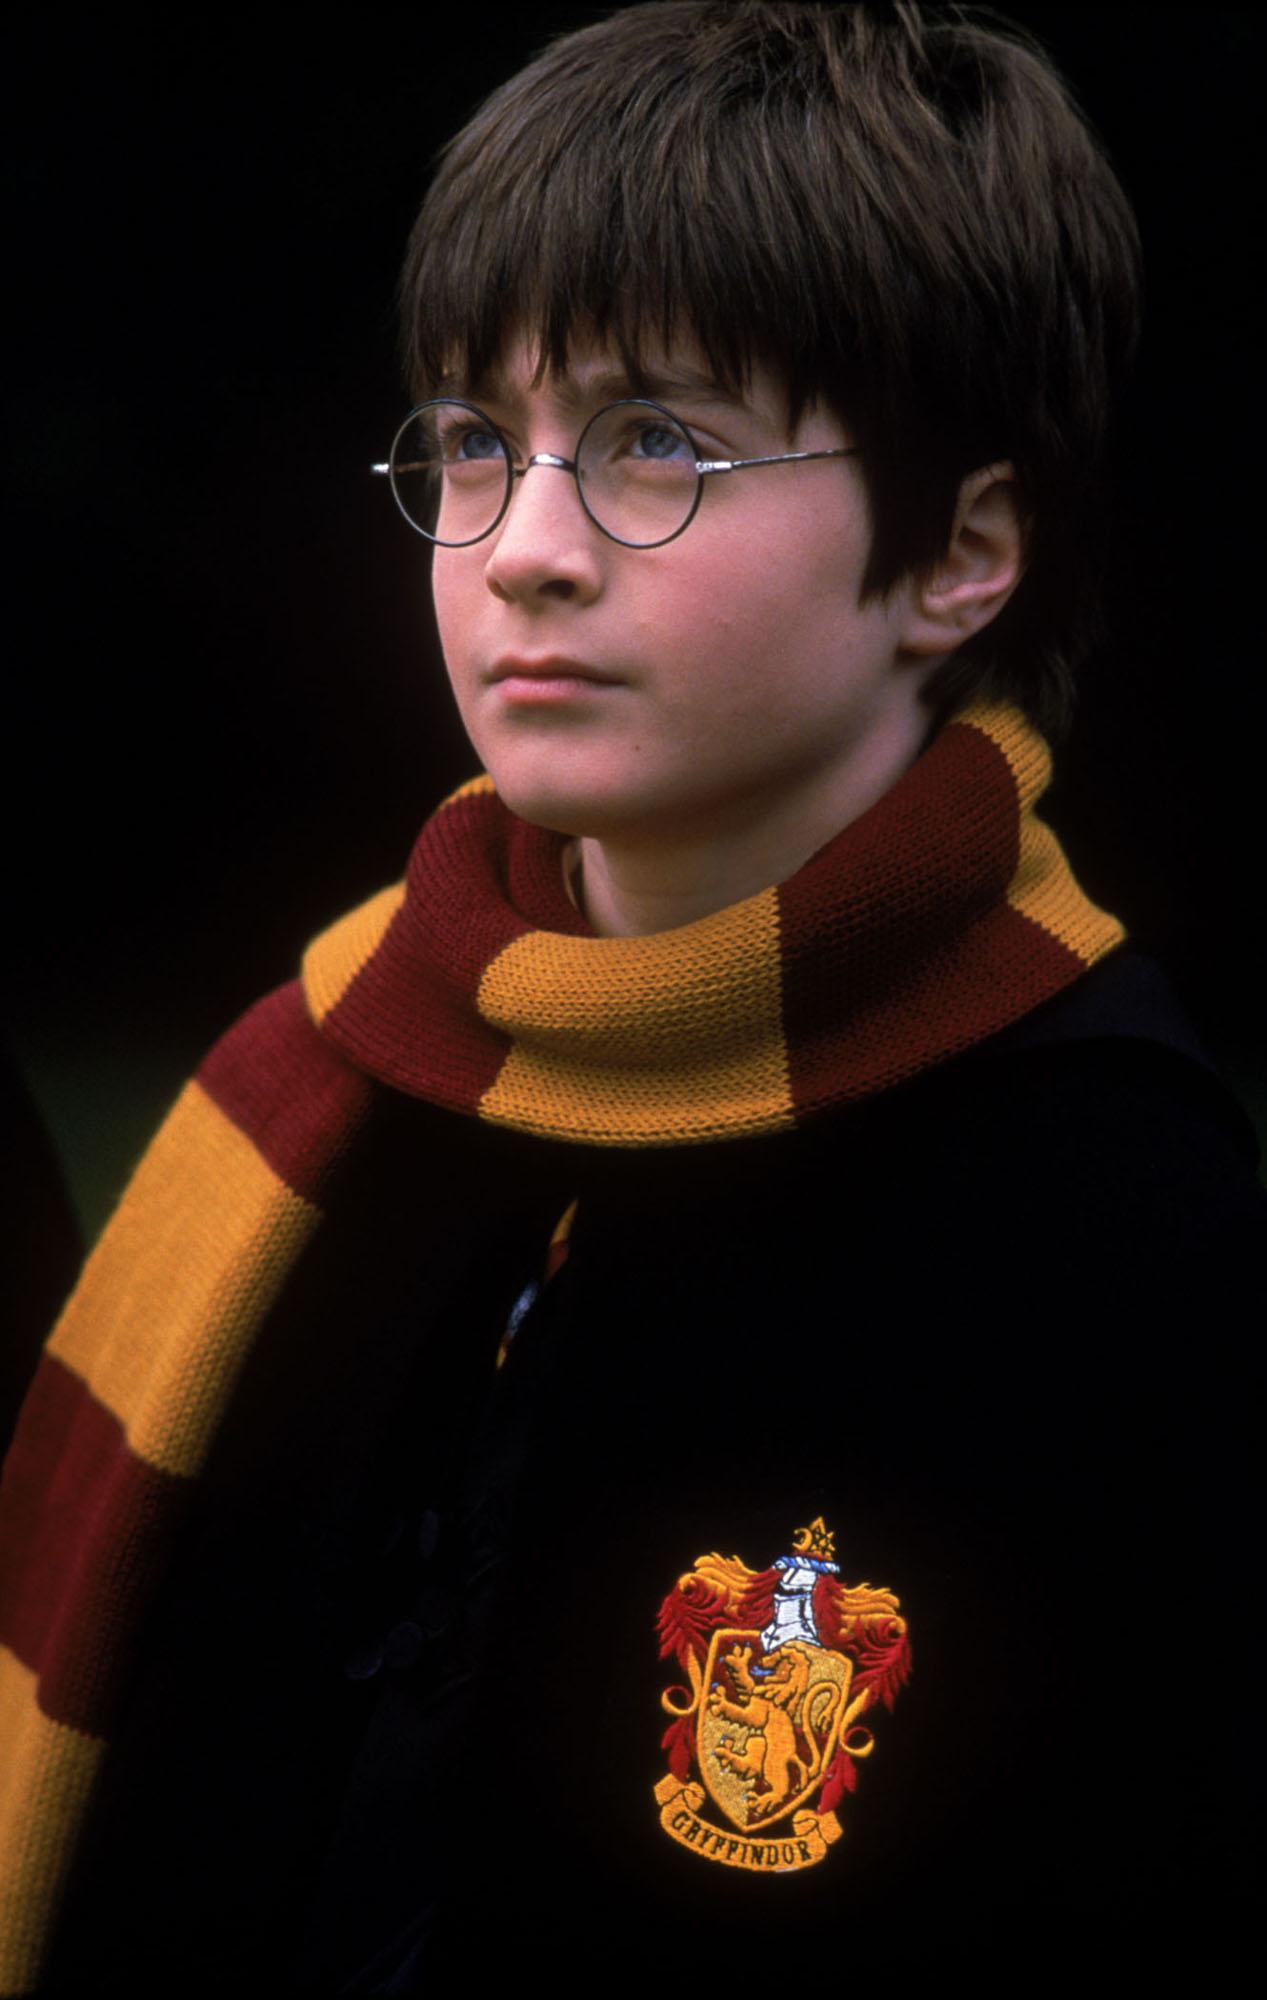 Гарри поттер стиль